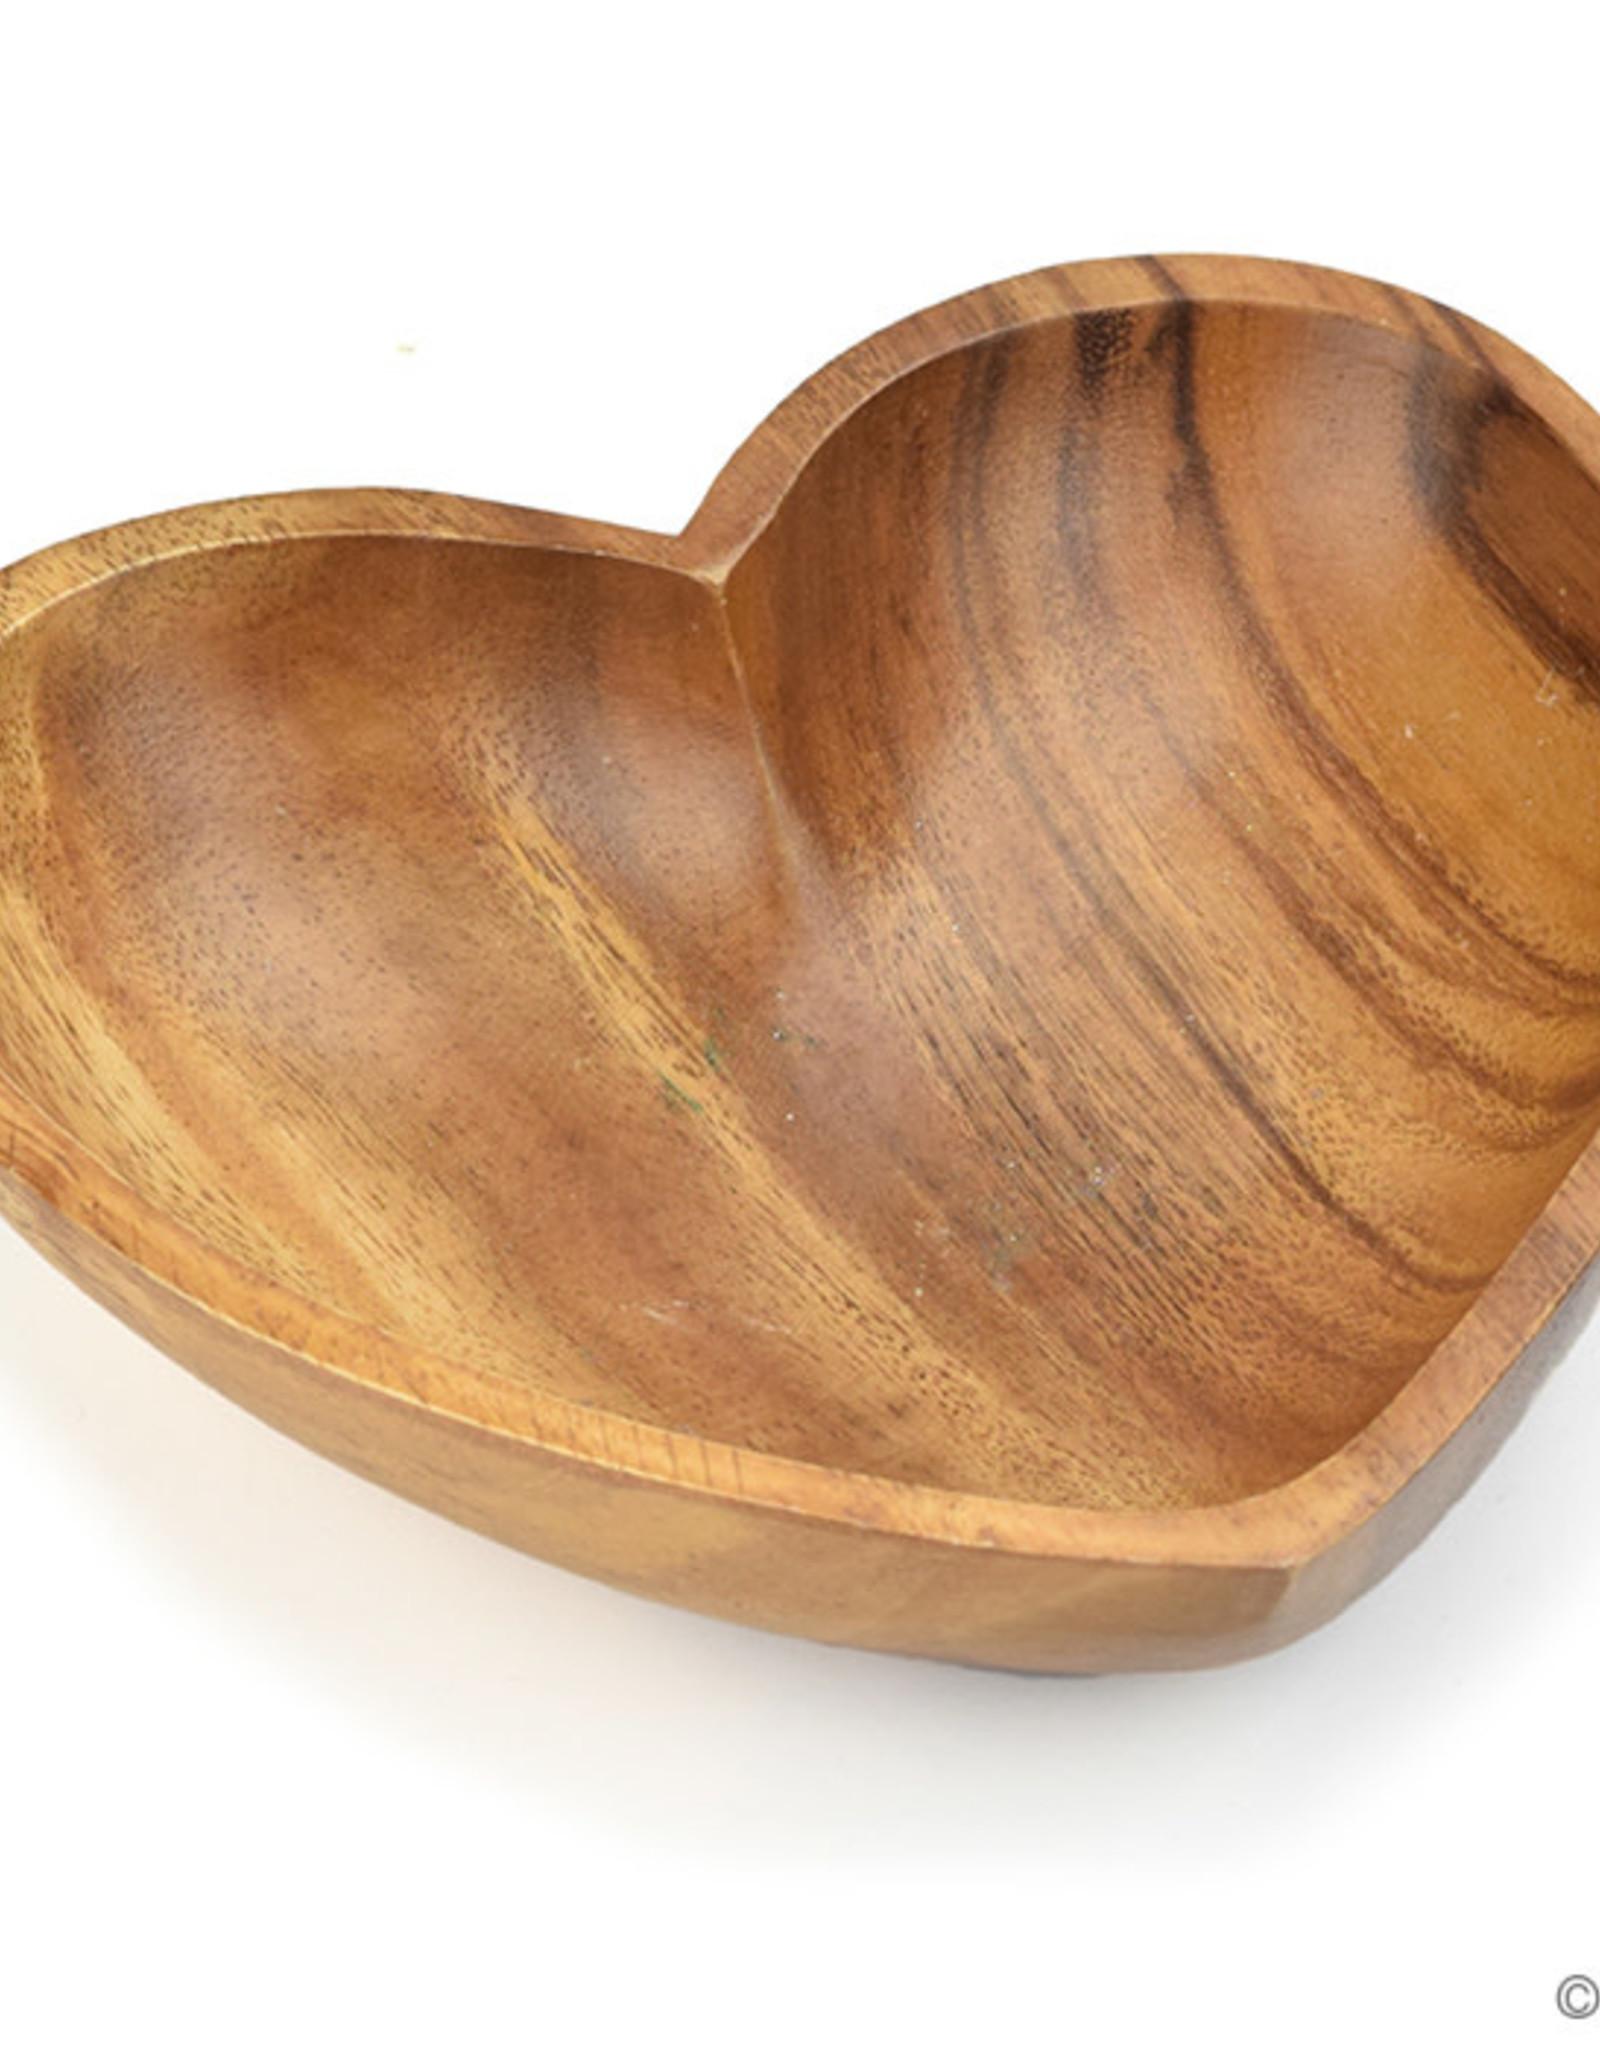 Serrv Acacia Heart Bowl